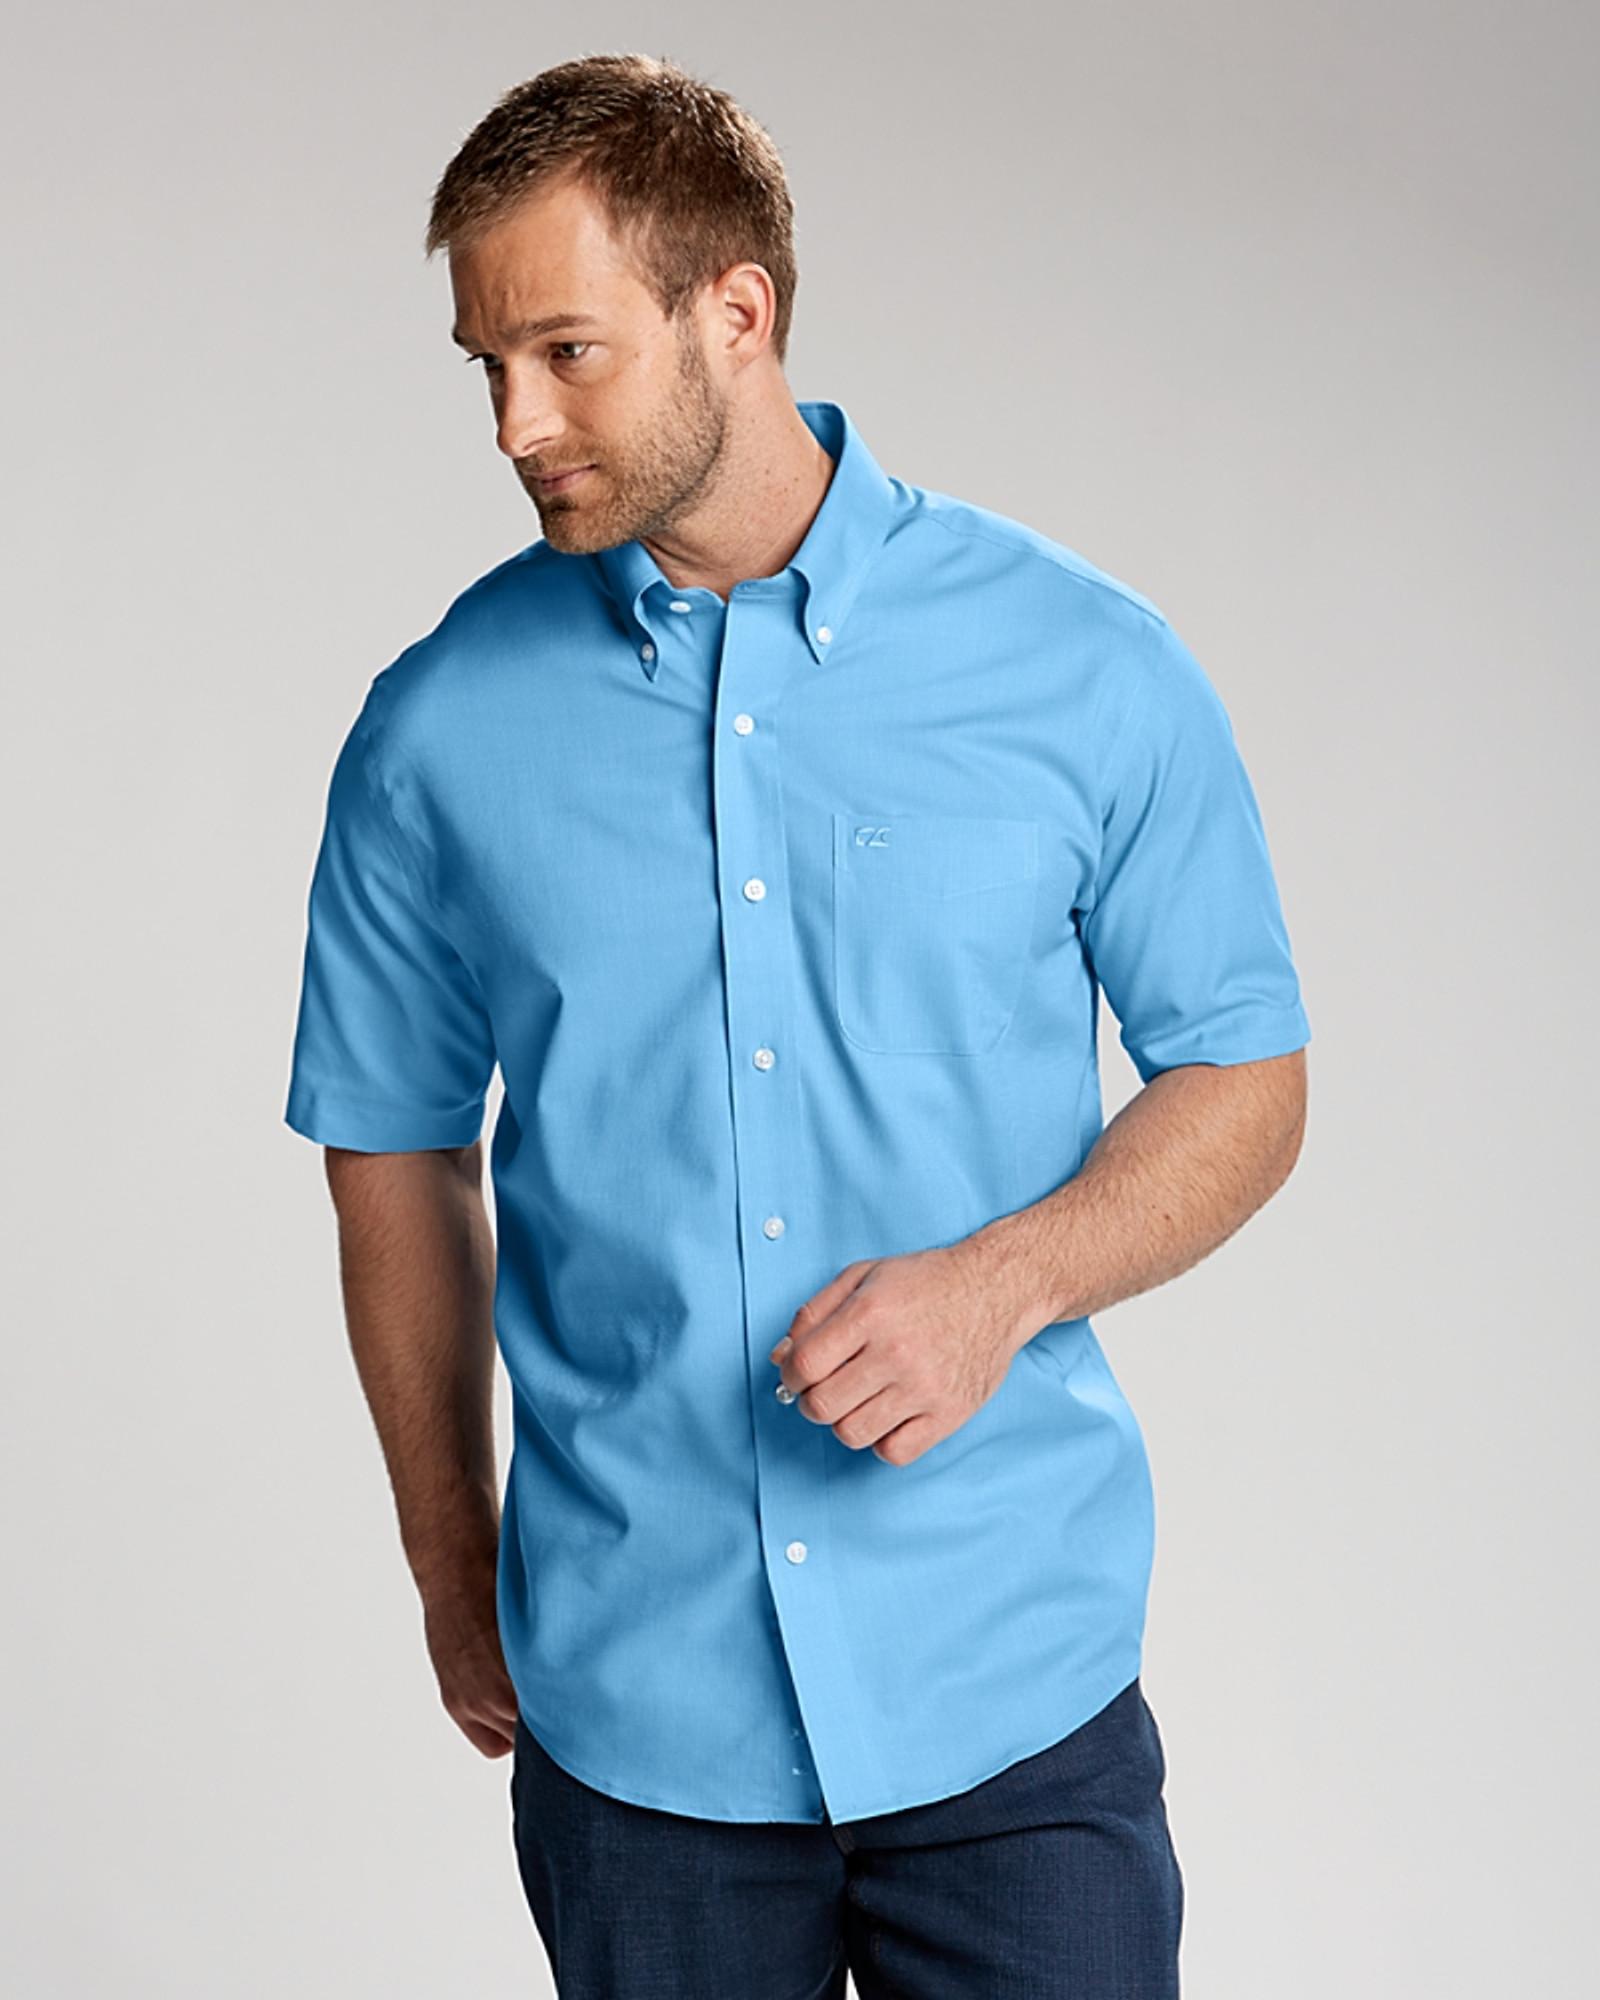 Cutter & Buck Epic Easy Care Nailshead Mens Short Sleeve Dress Shirt